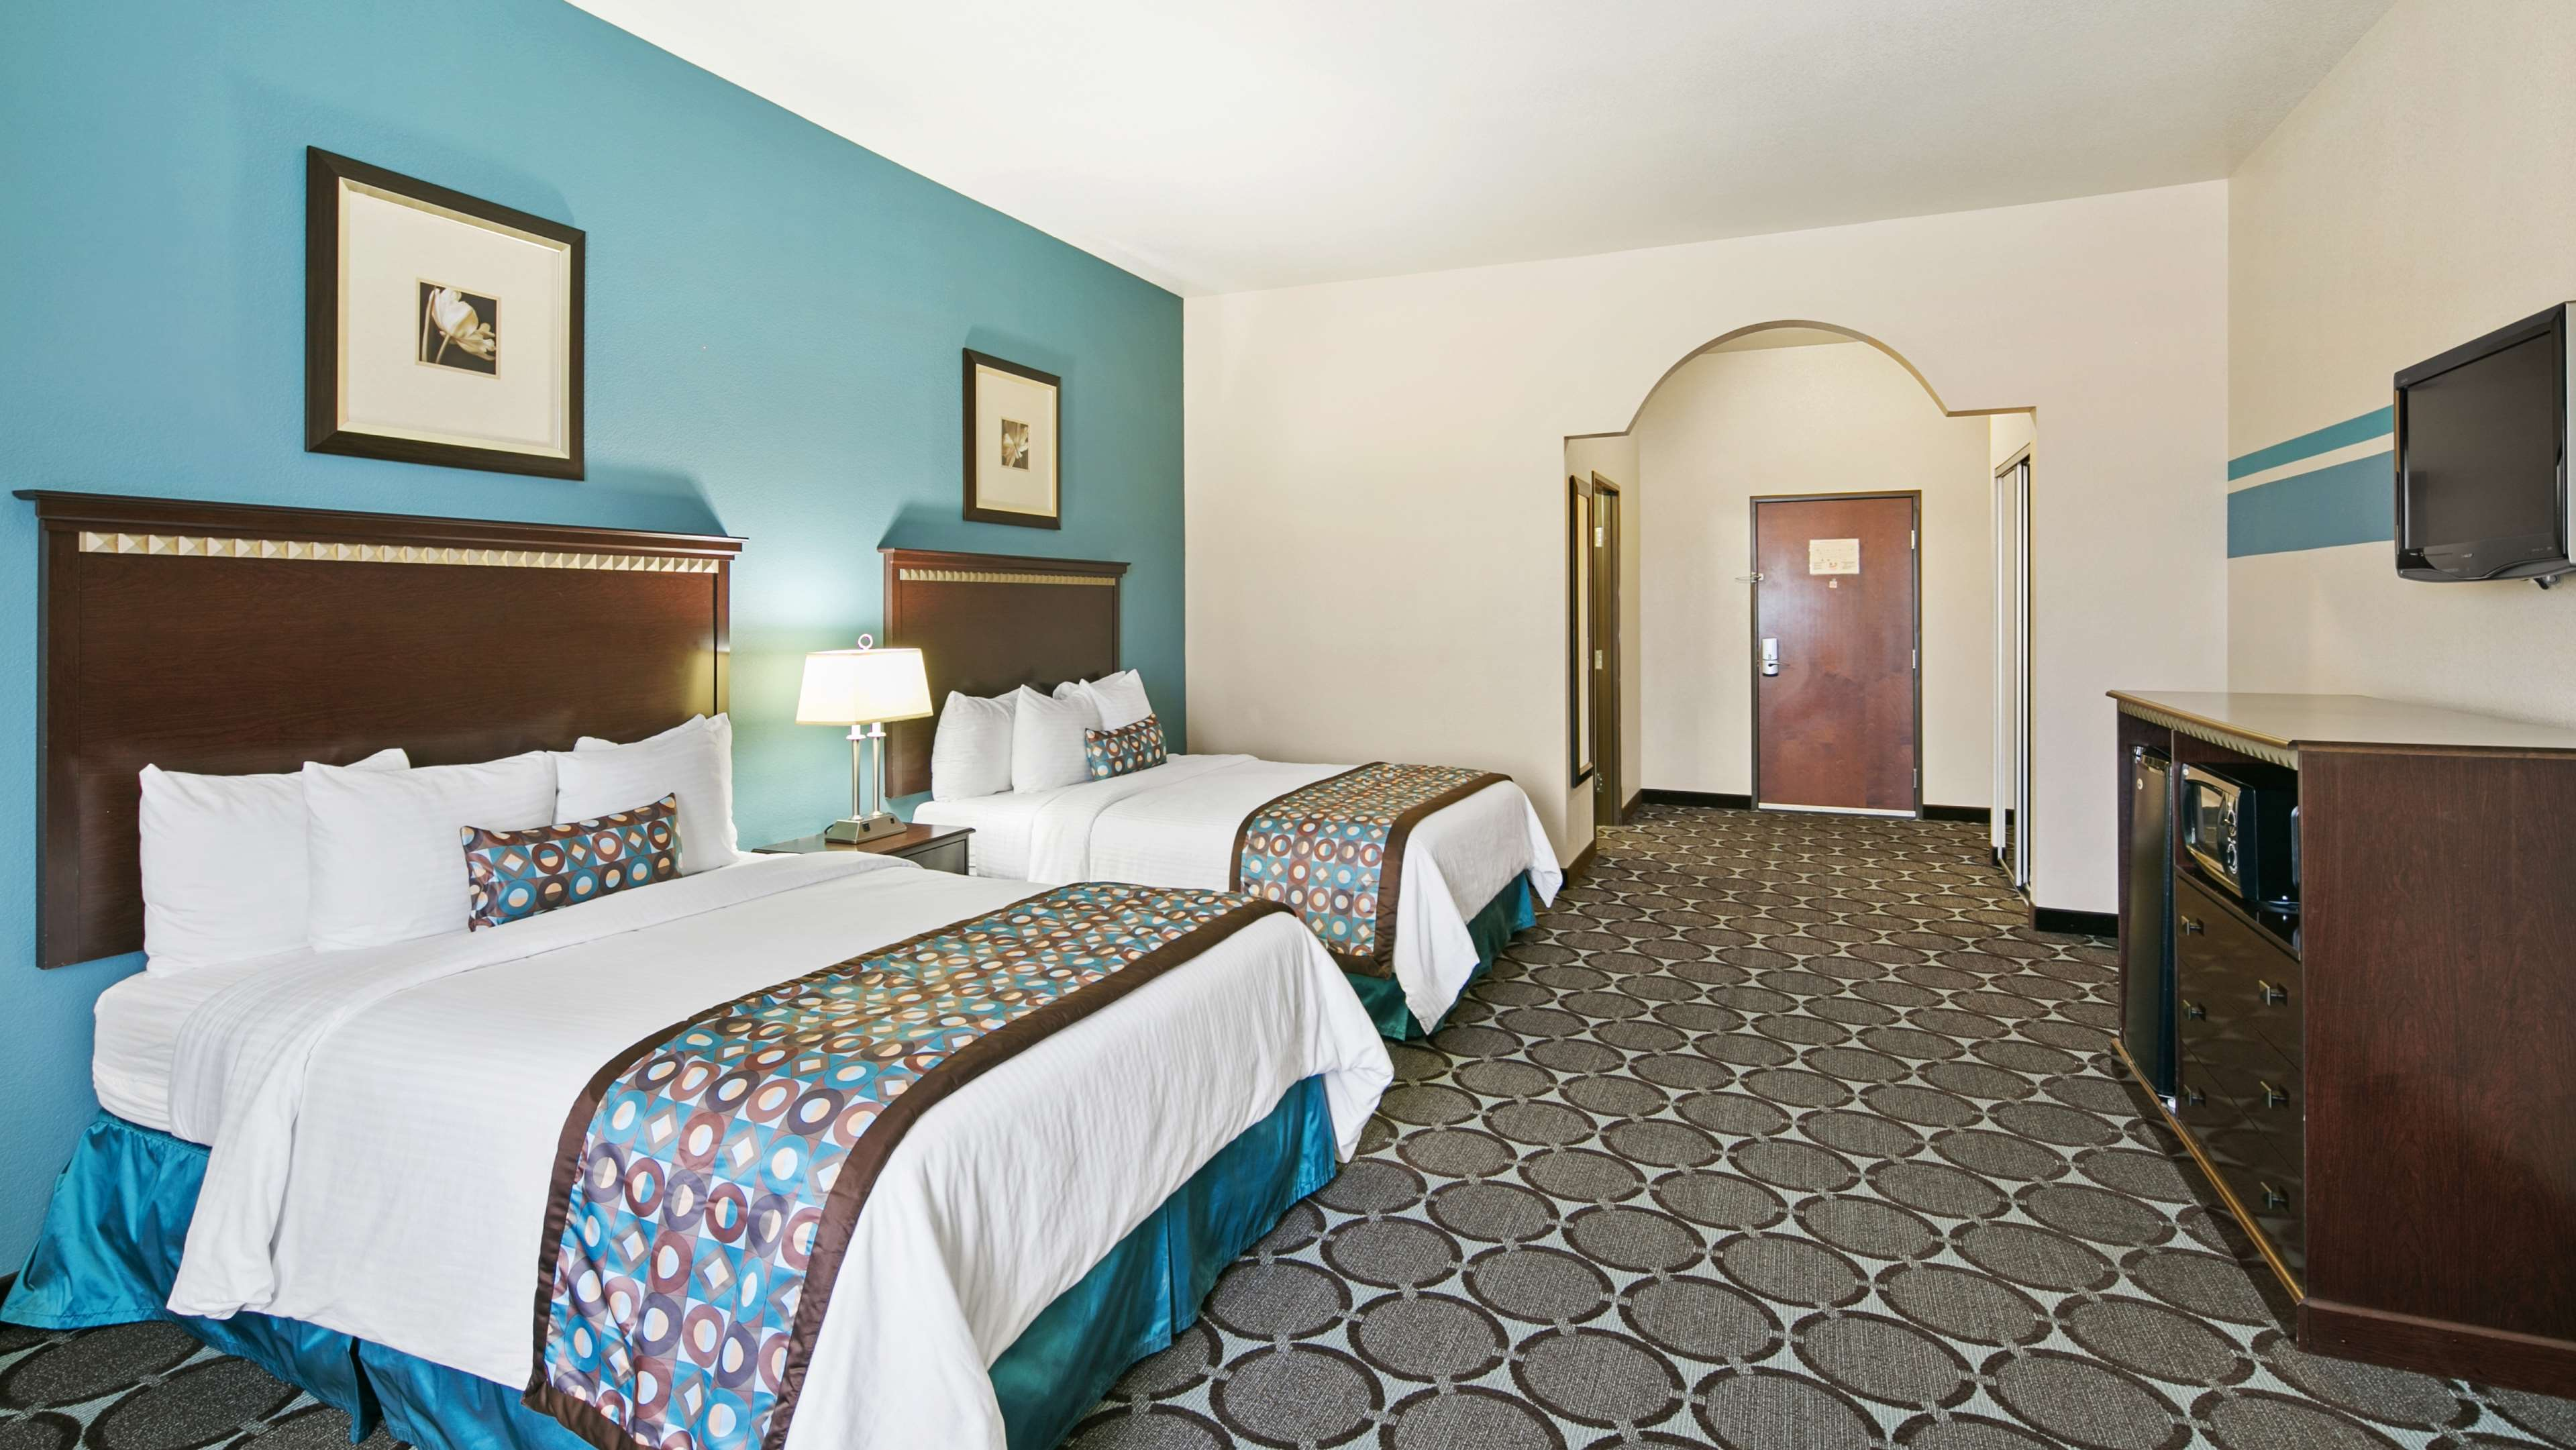 Best Western Hotel In Nogales Az